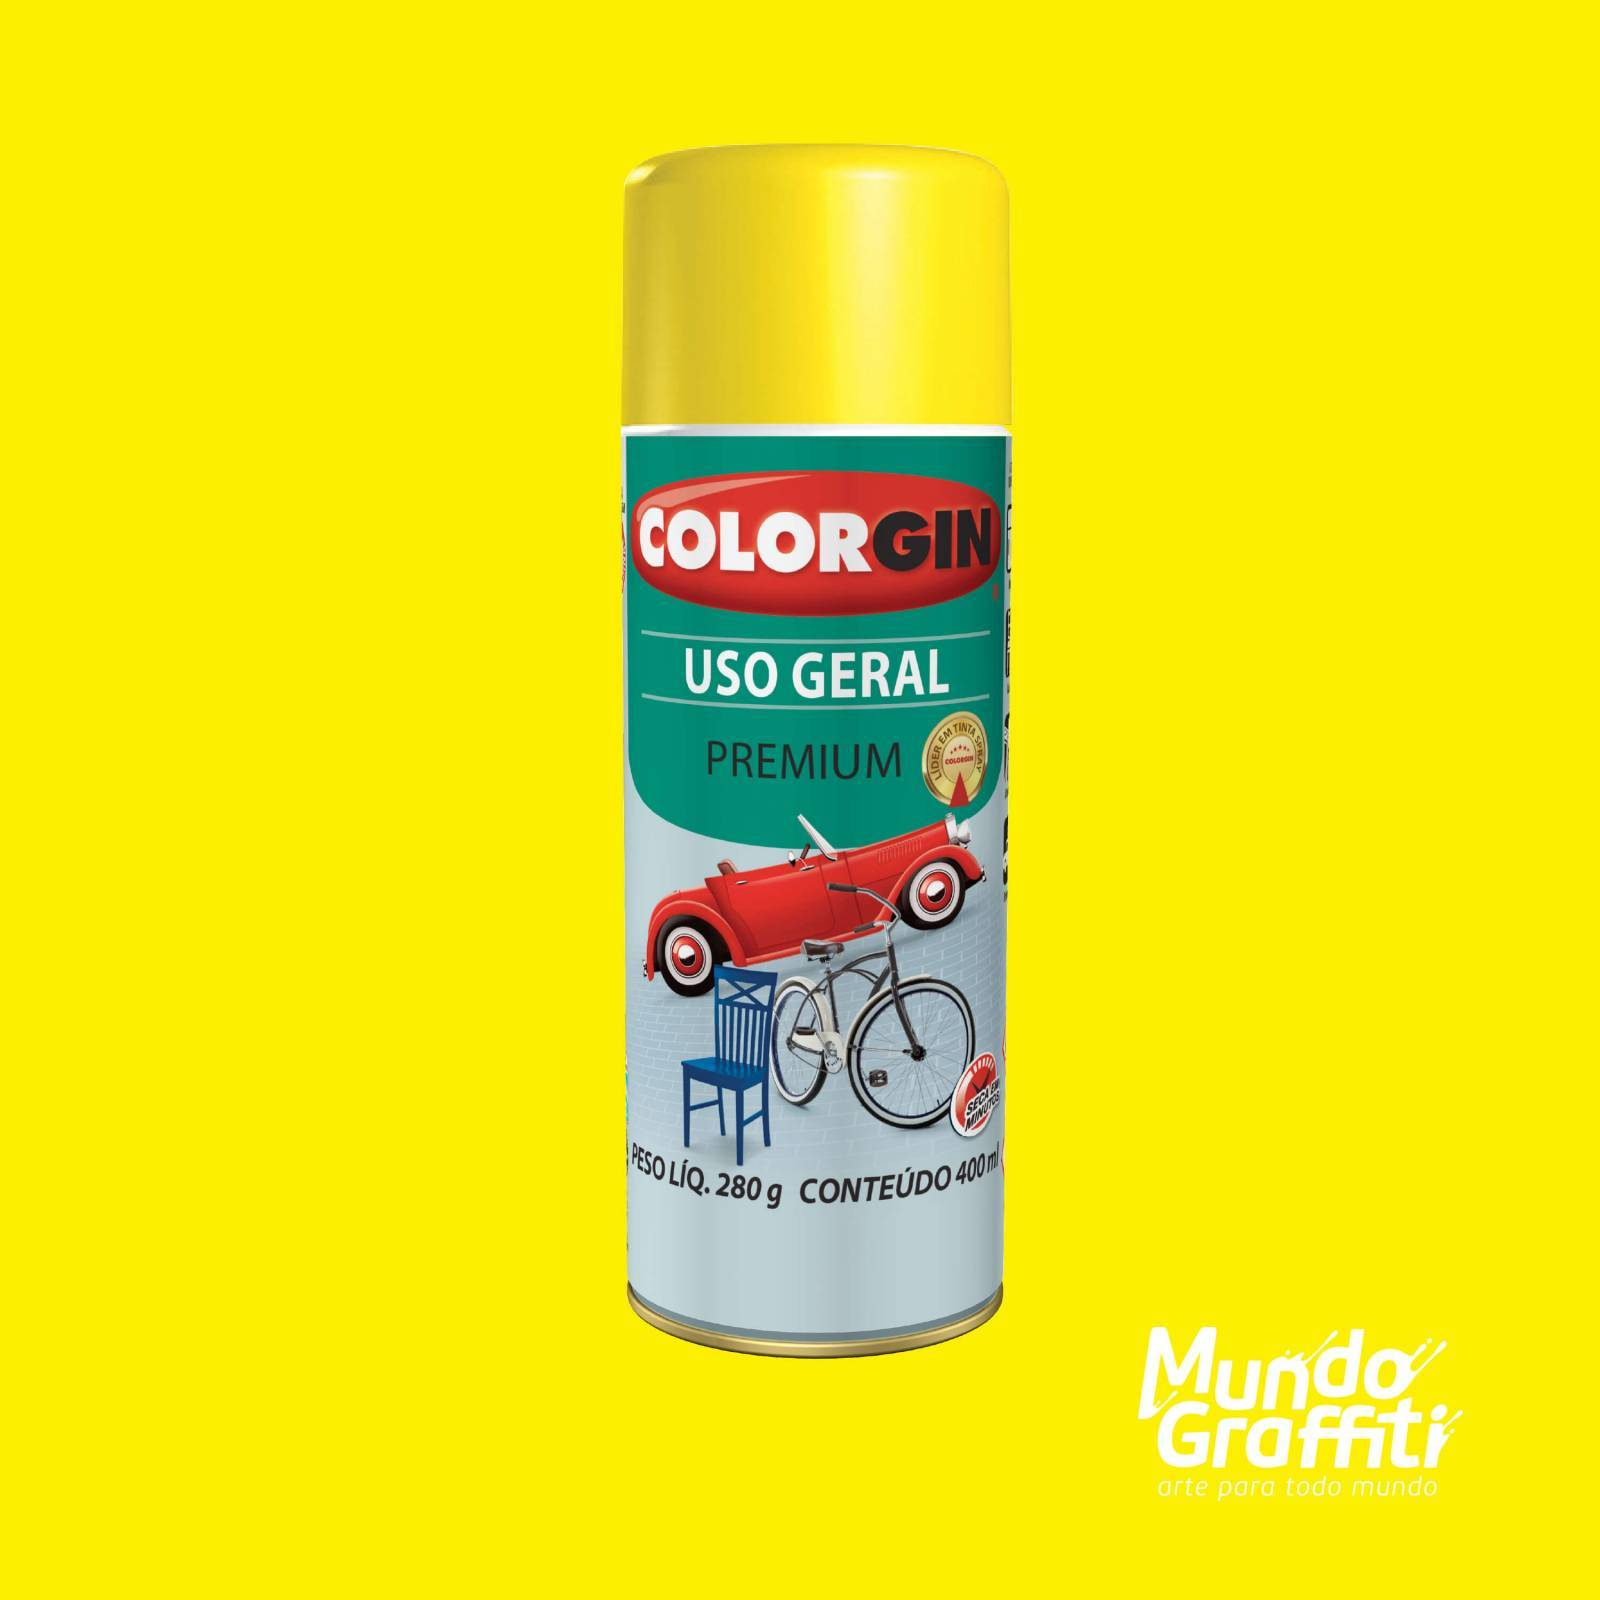 Tinta Spray Colorgin Uso Geral 55081 Amarelo 400ml - Mundo Graffiti